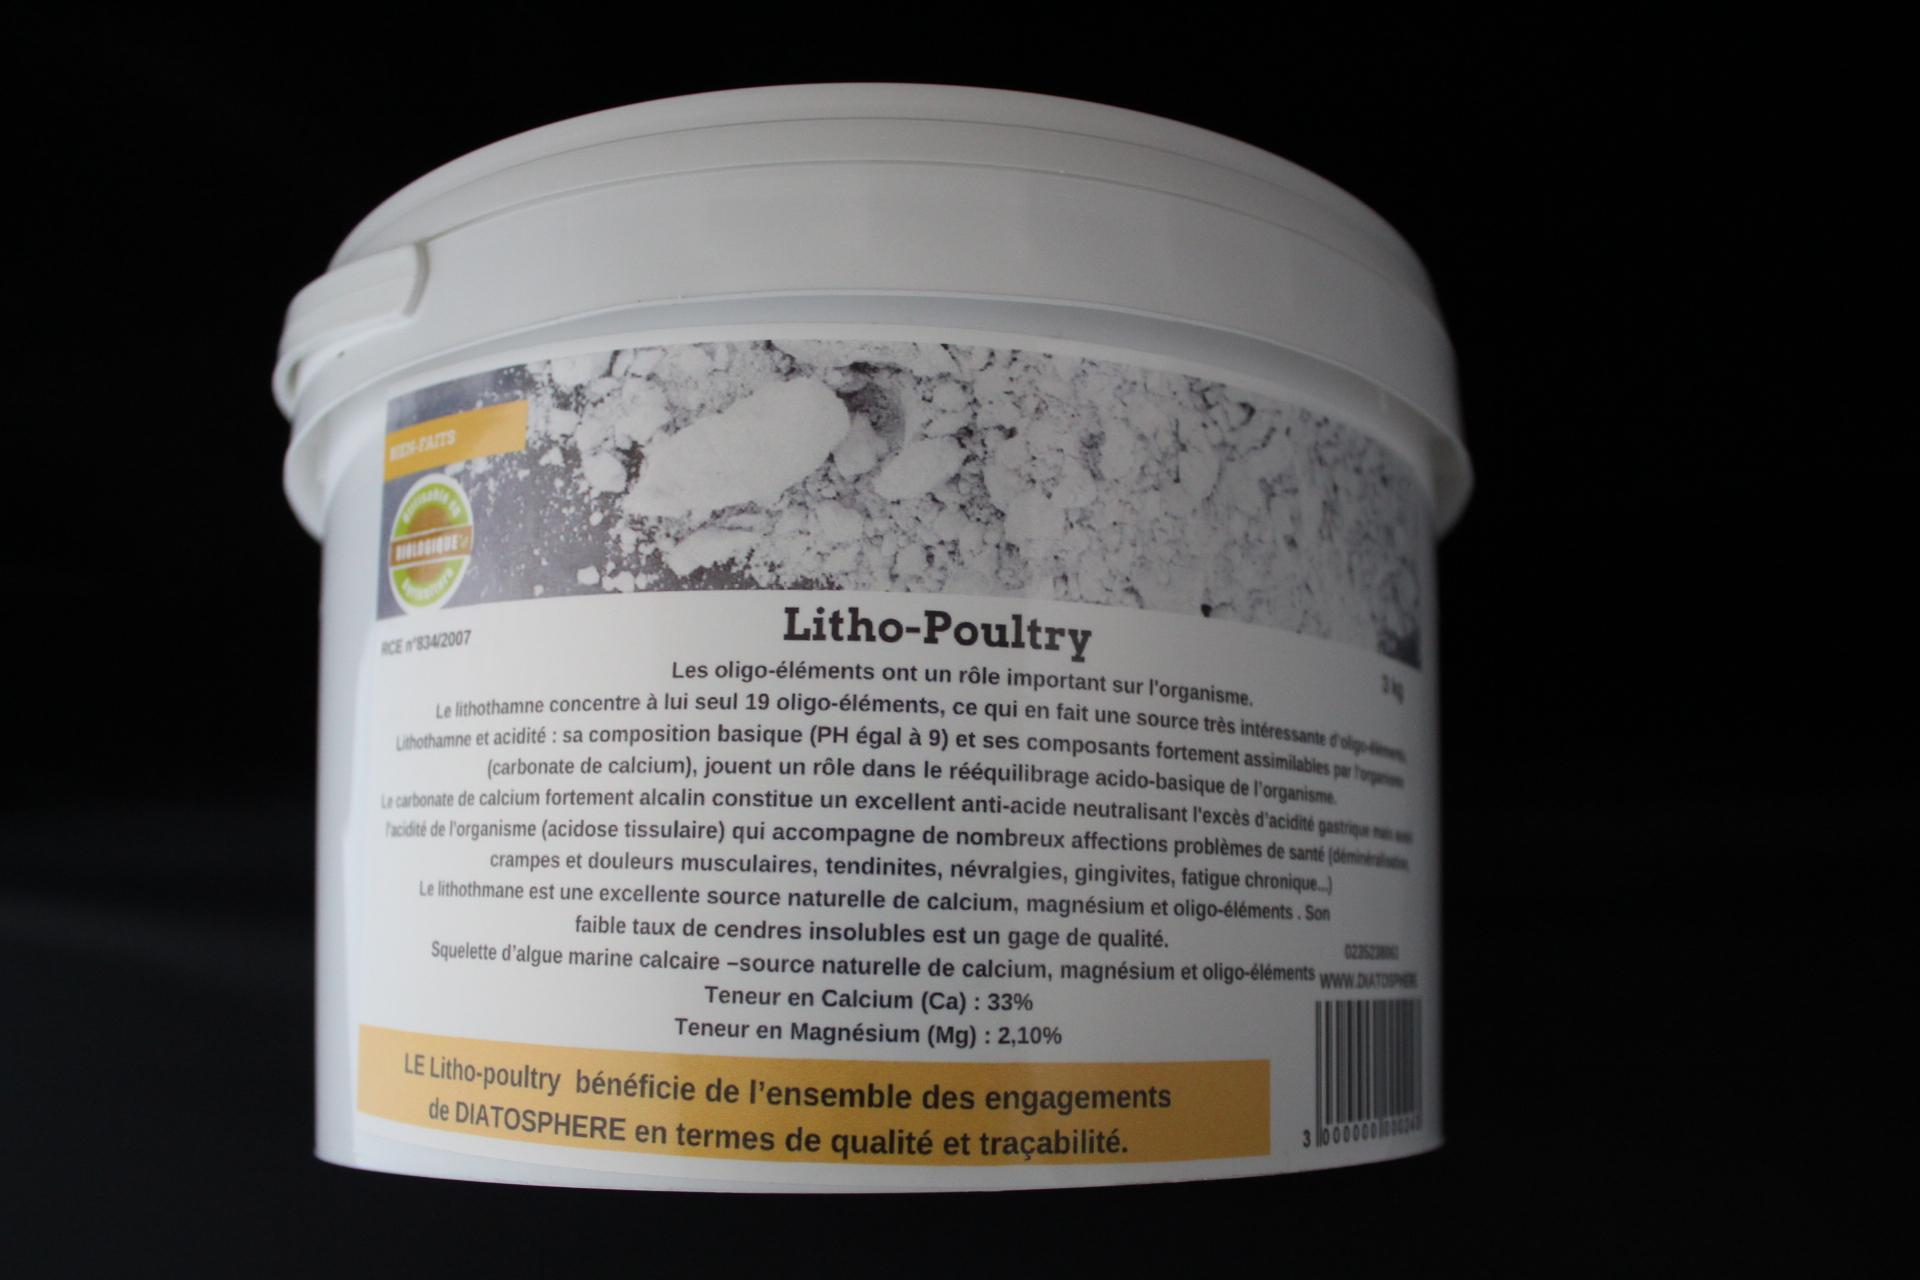 Litho-Poultry